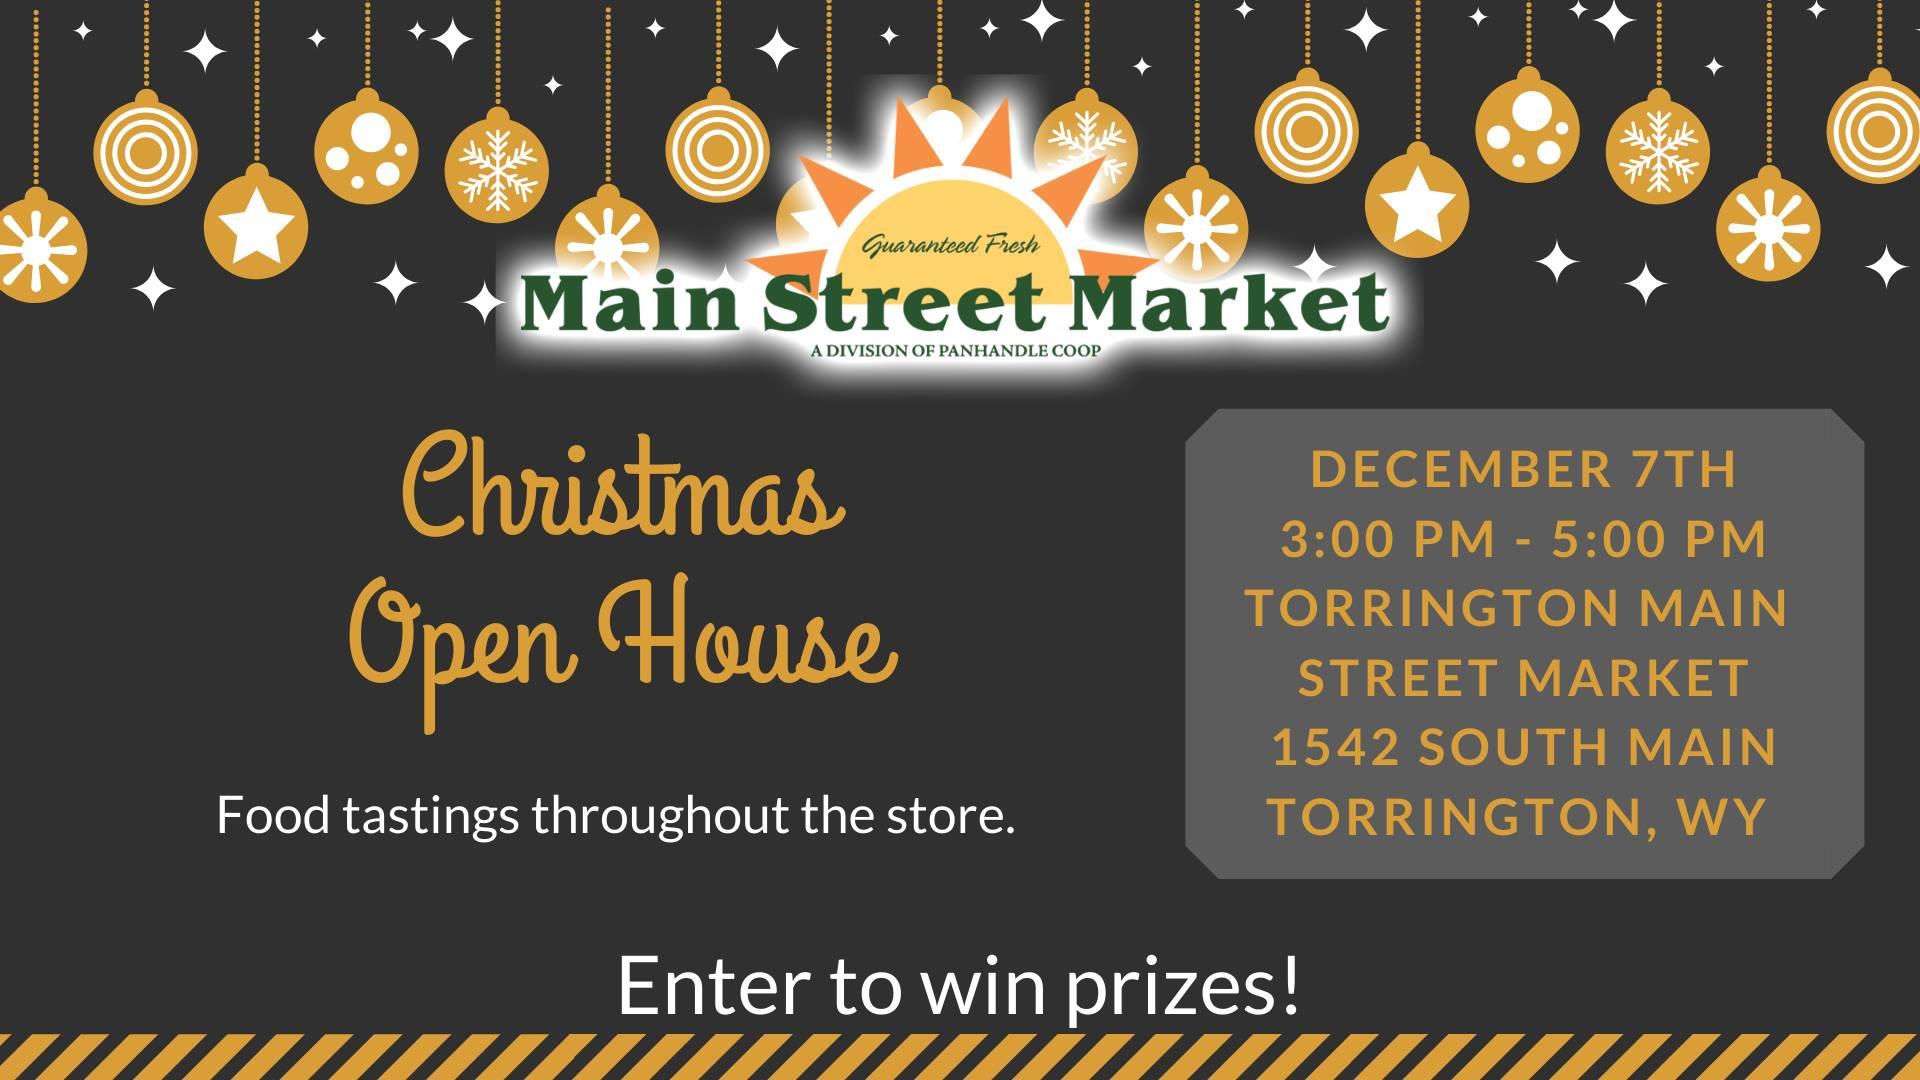 Main Street Market Christmas Open House Photo